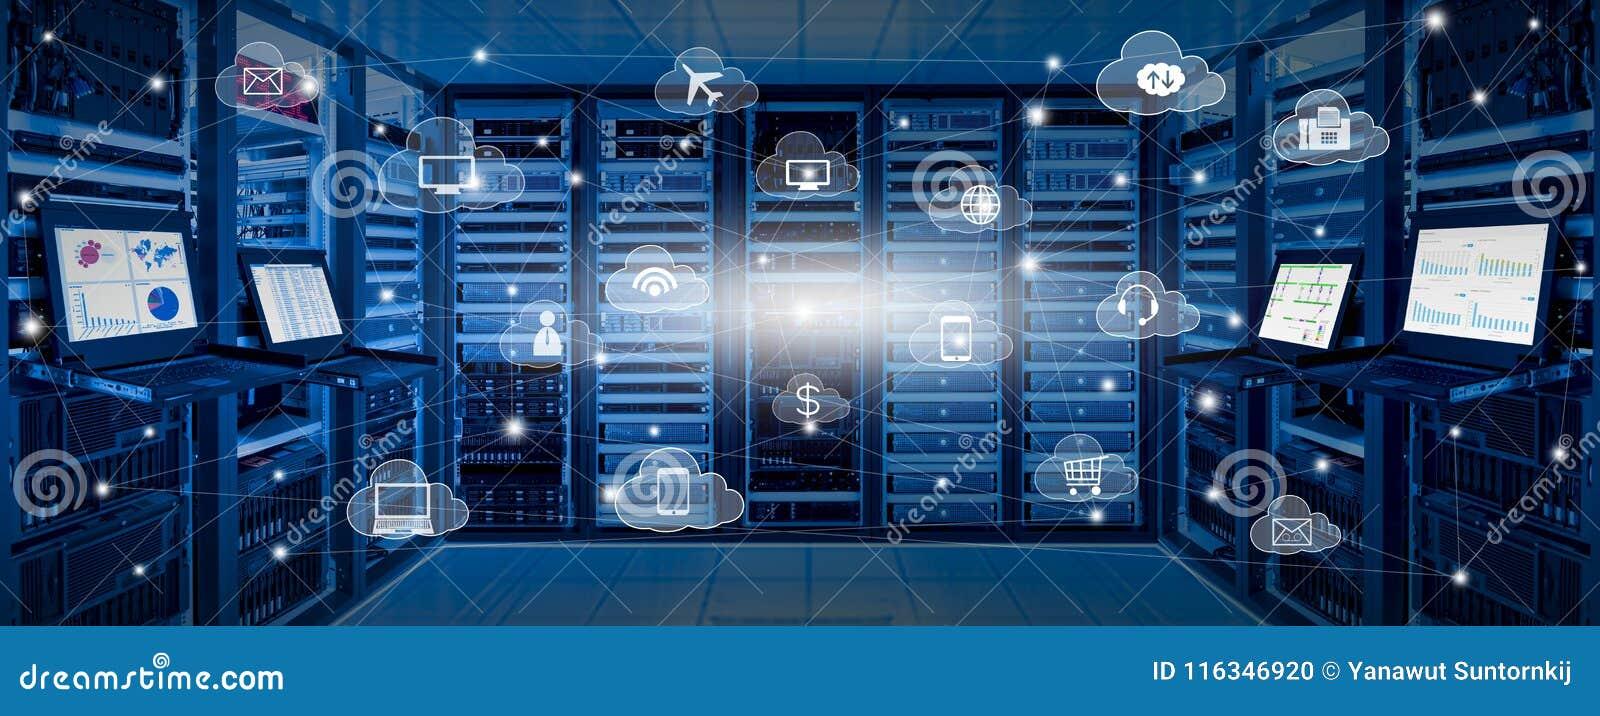 Internet data center and cloud services concept